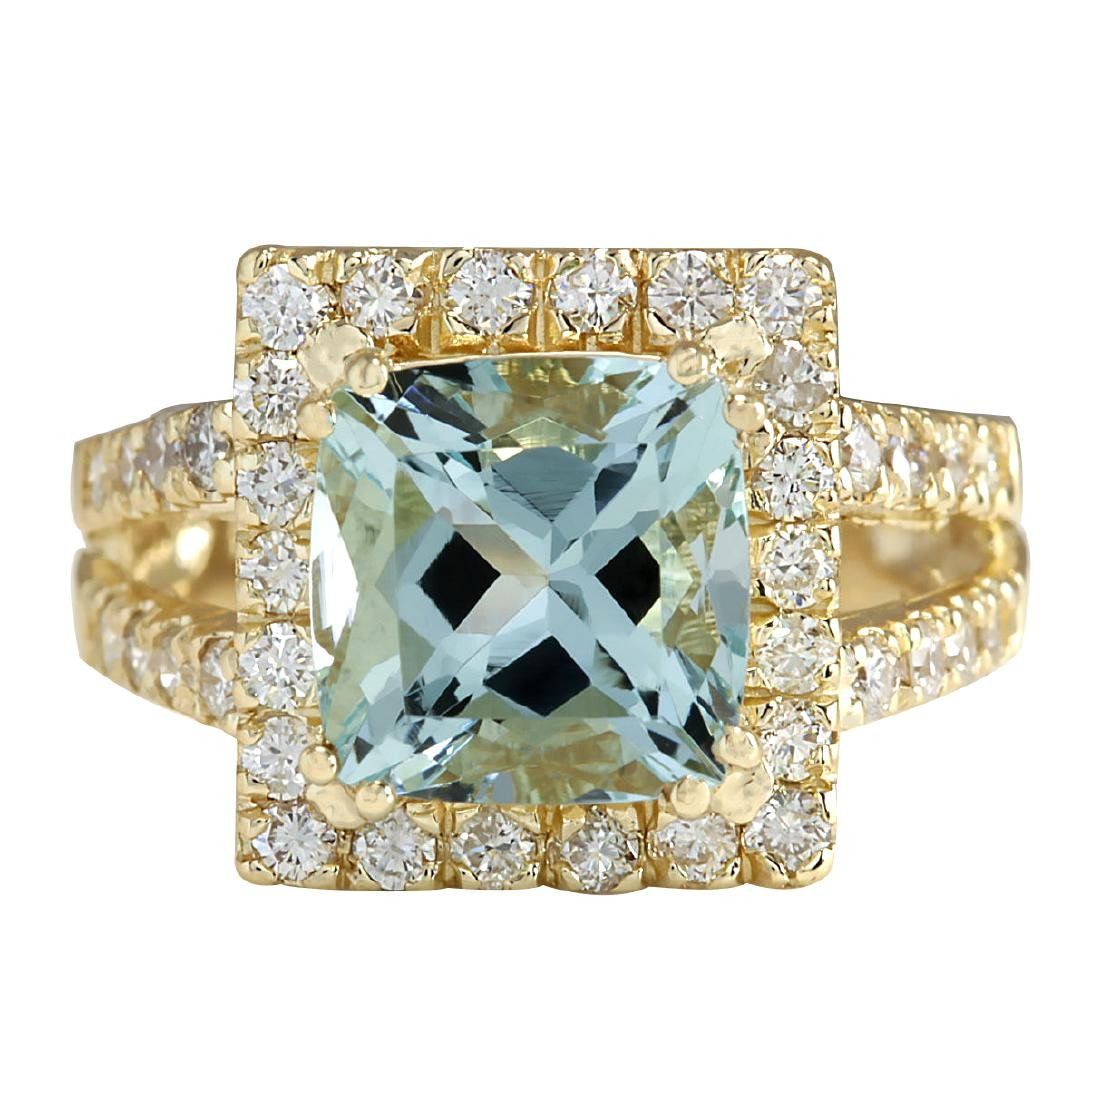 4.13CTW Natural Aquamarine And Diamond Ring In 18K